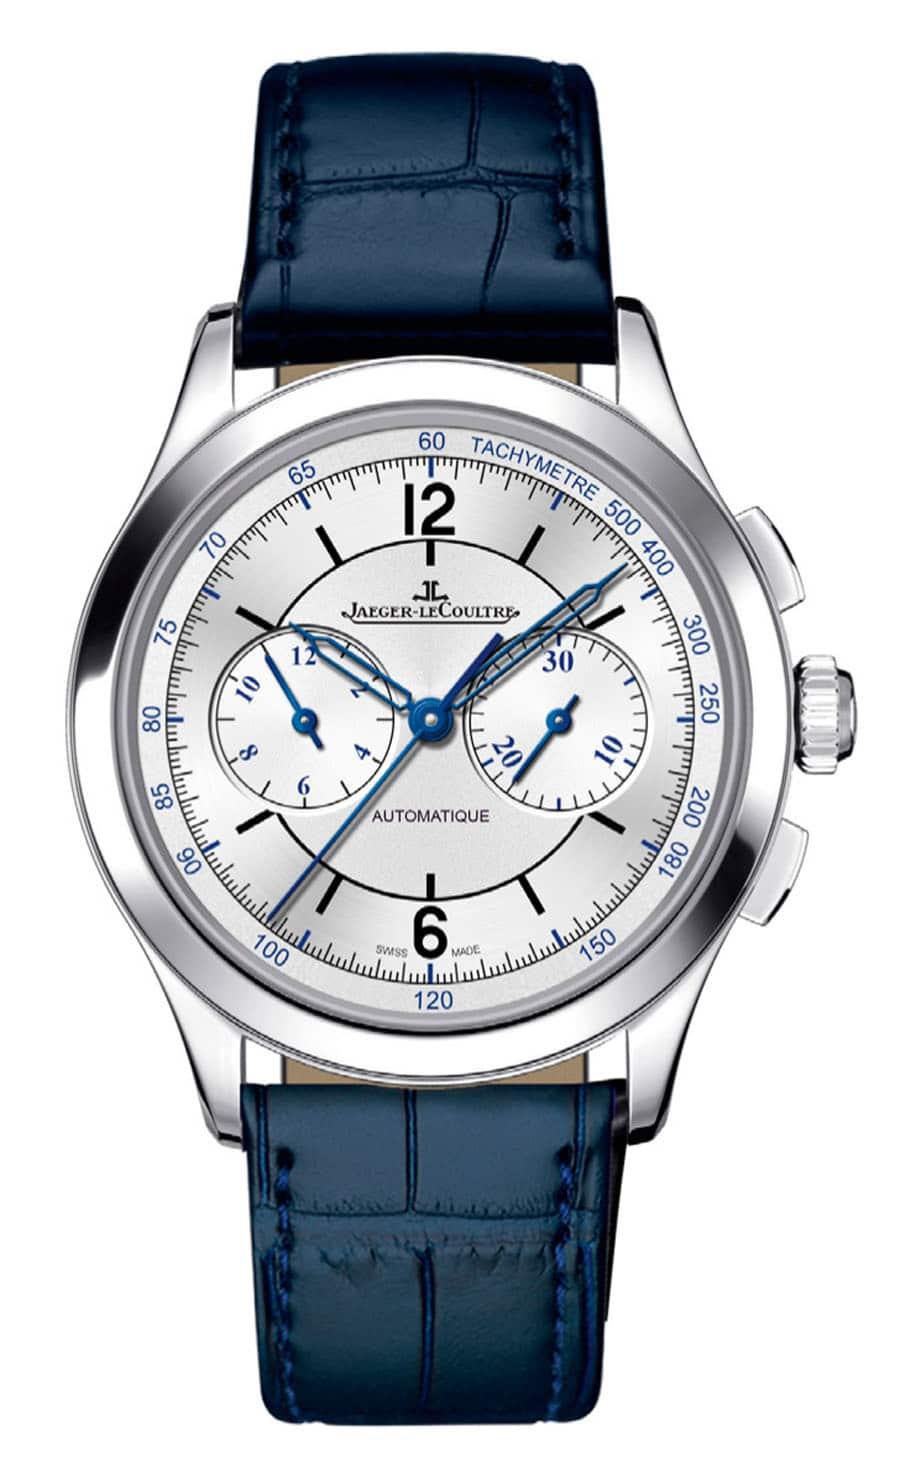 Jaeger-LeCoultre: Master Chronograph im Retrodesign